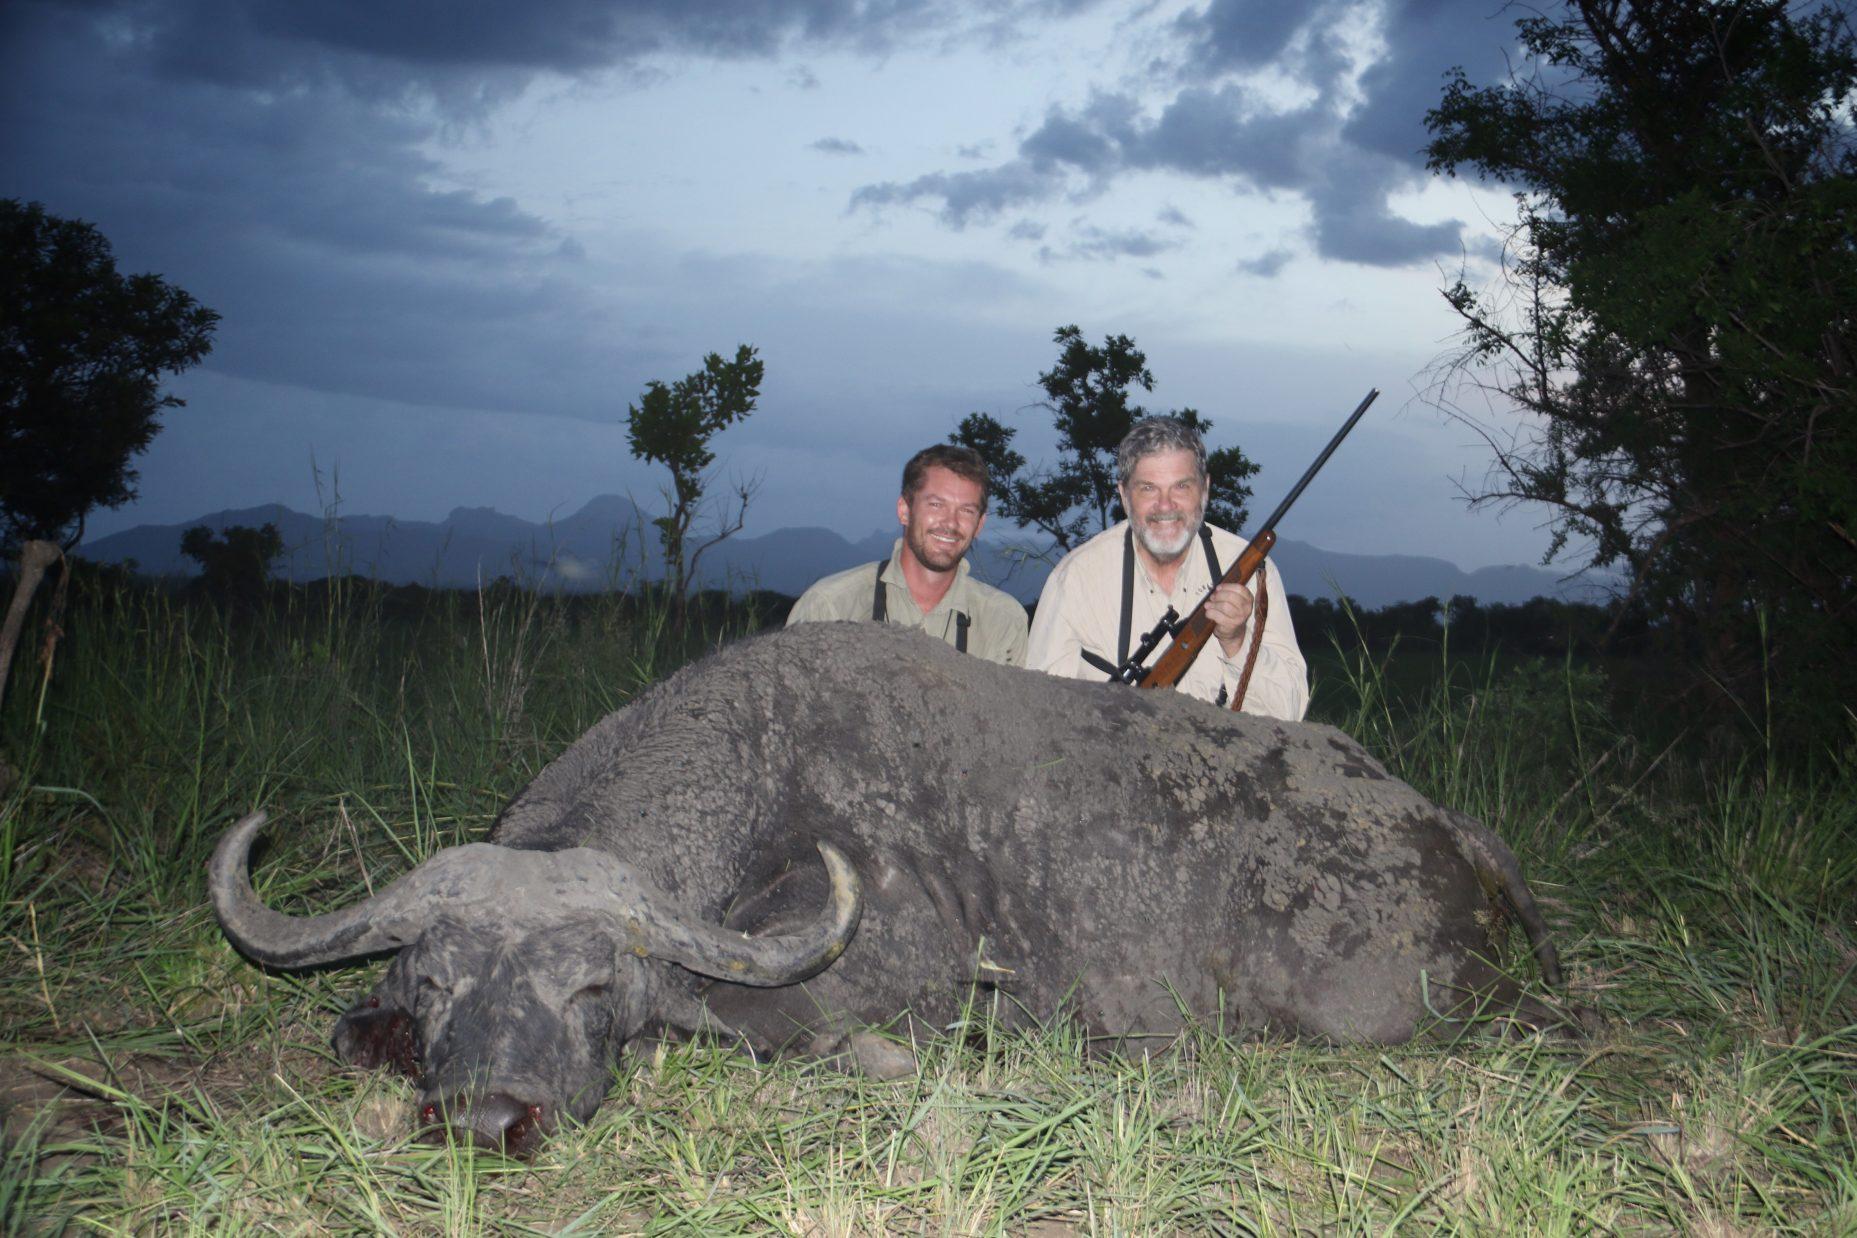 uganda wildlife safaris trophy photos 2017 (47) buffalo